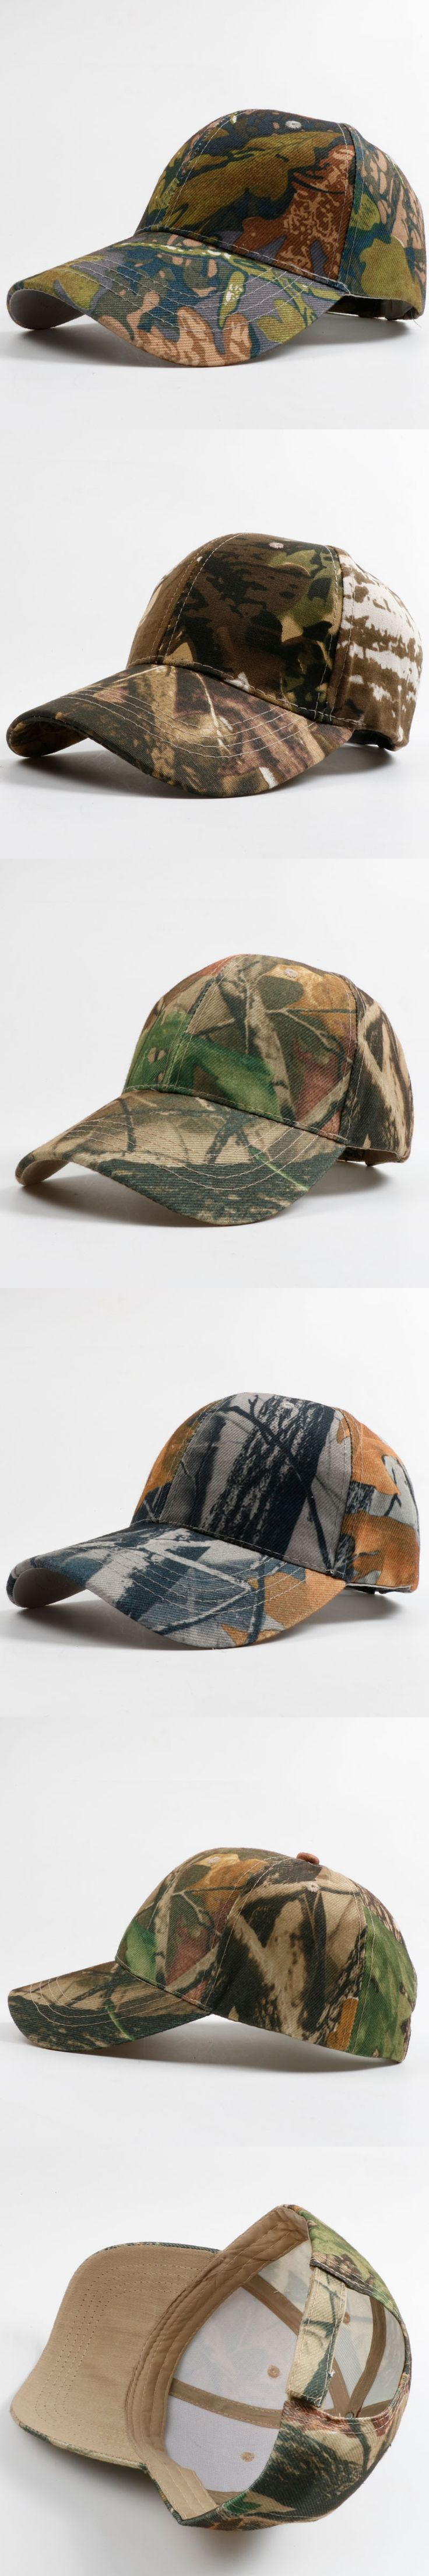 Baseball Cap Men Tactical Cap Hunting Camouflage Snapback Hat Gorras Camo Baseball Cap Adjustable Fishier Snapbacks Hat